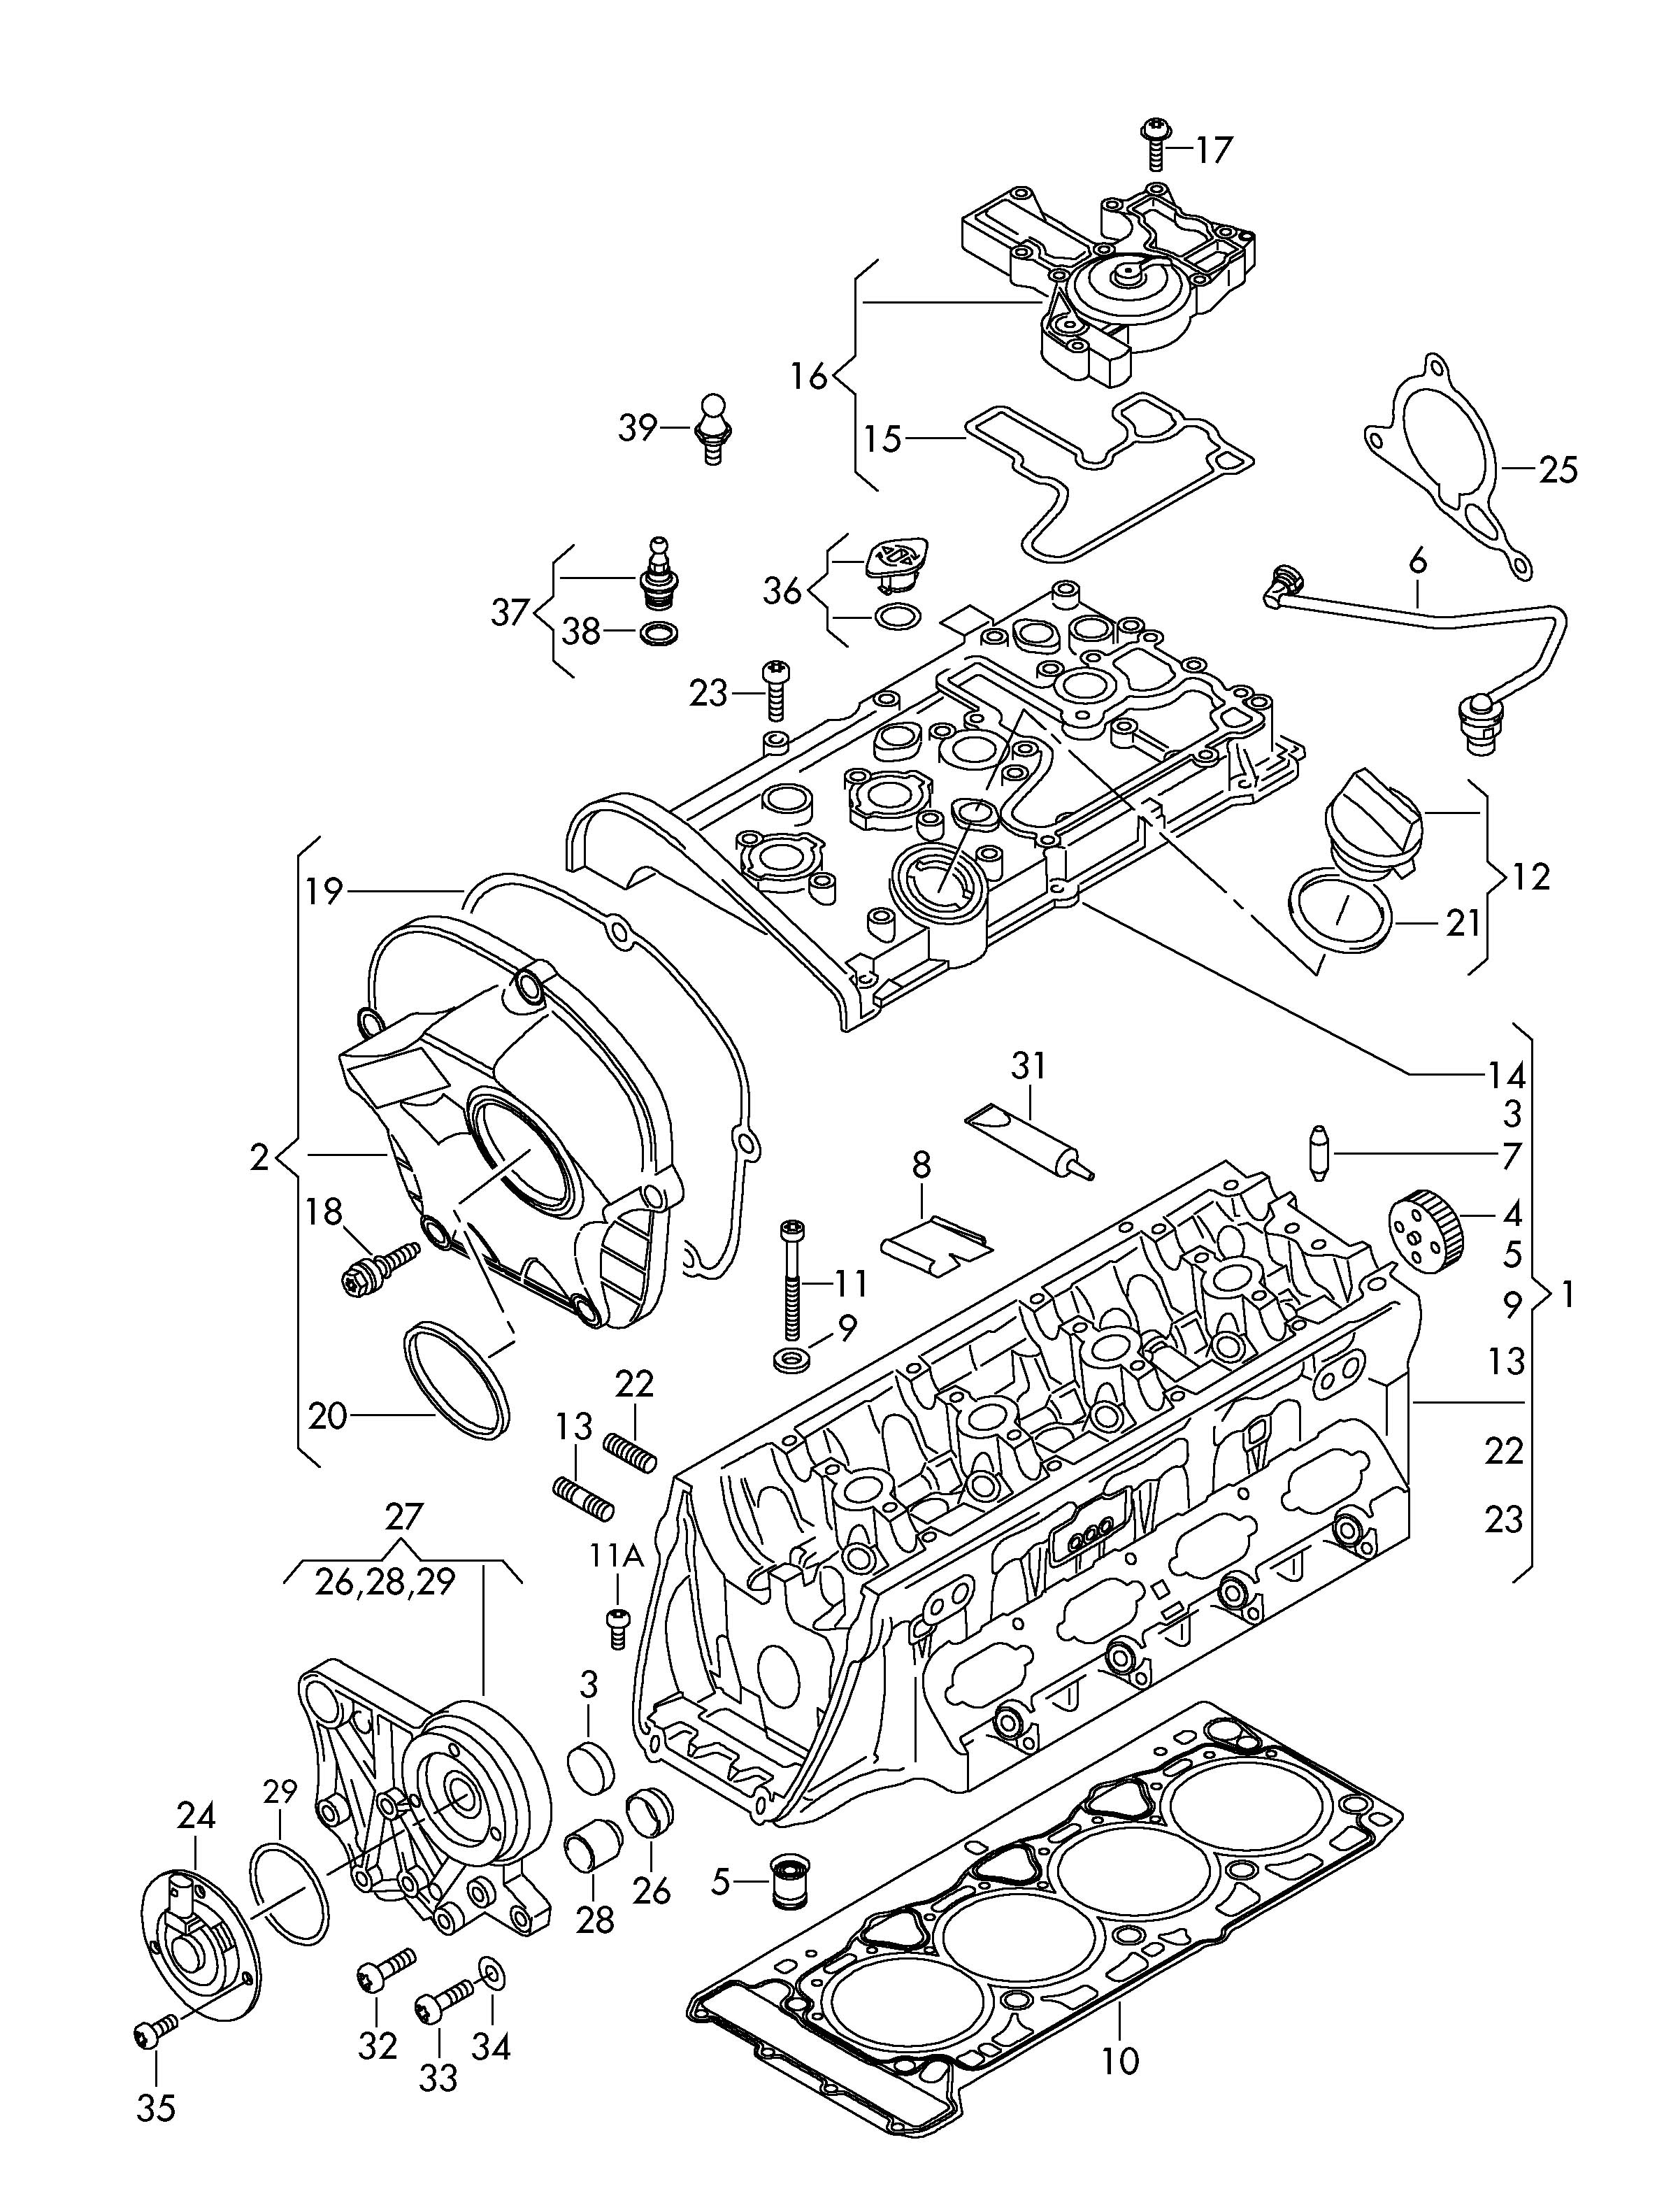 Volkswagen Golf Round Hd Screw Coverscrew